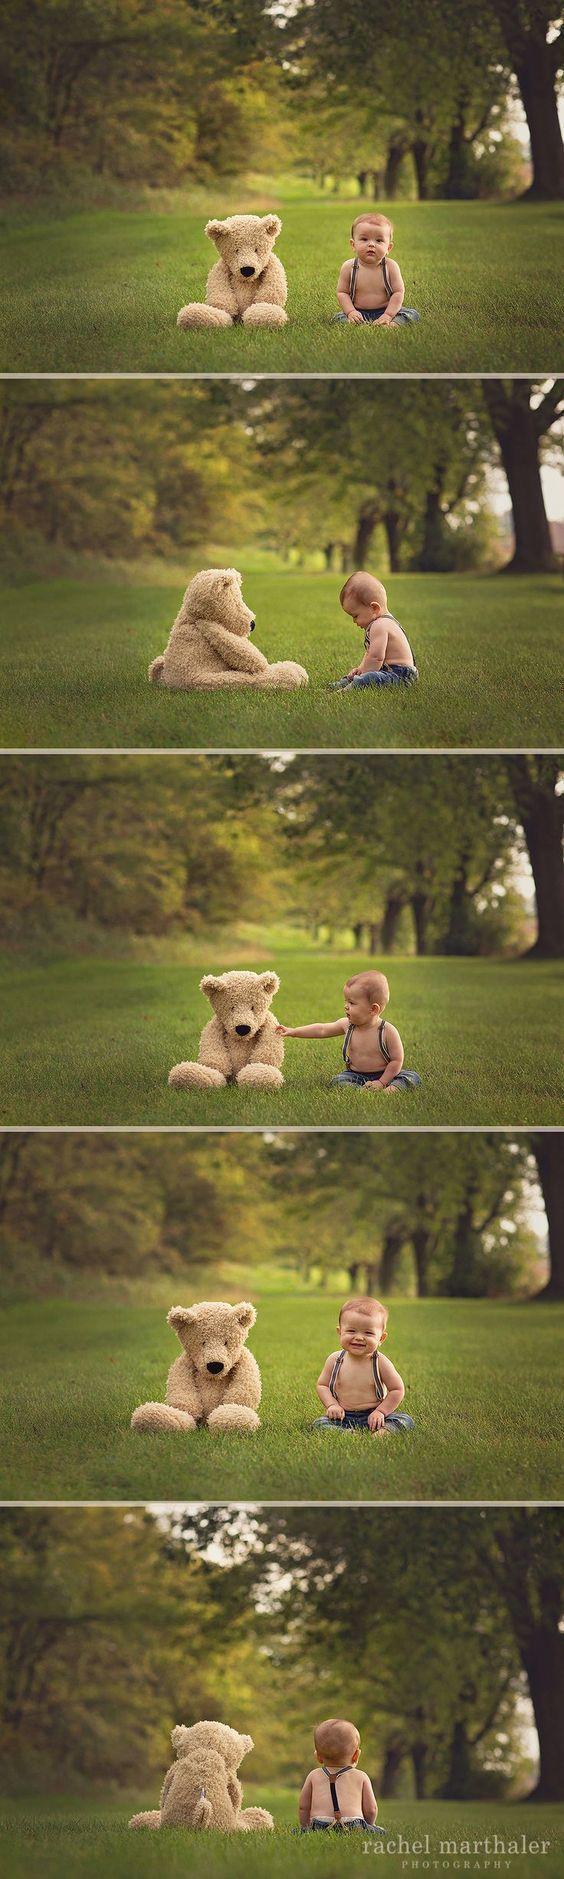 Entzückende Babyfotos – #Babyfotos #Entzückende